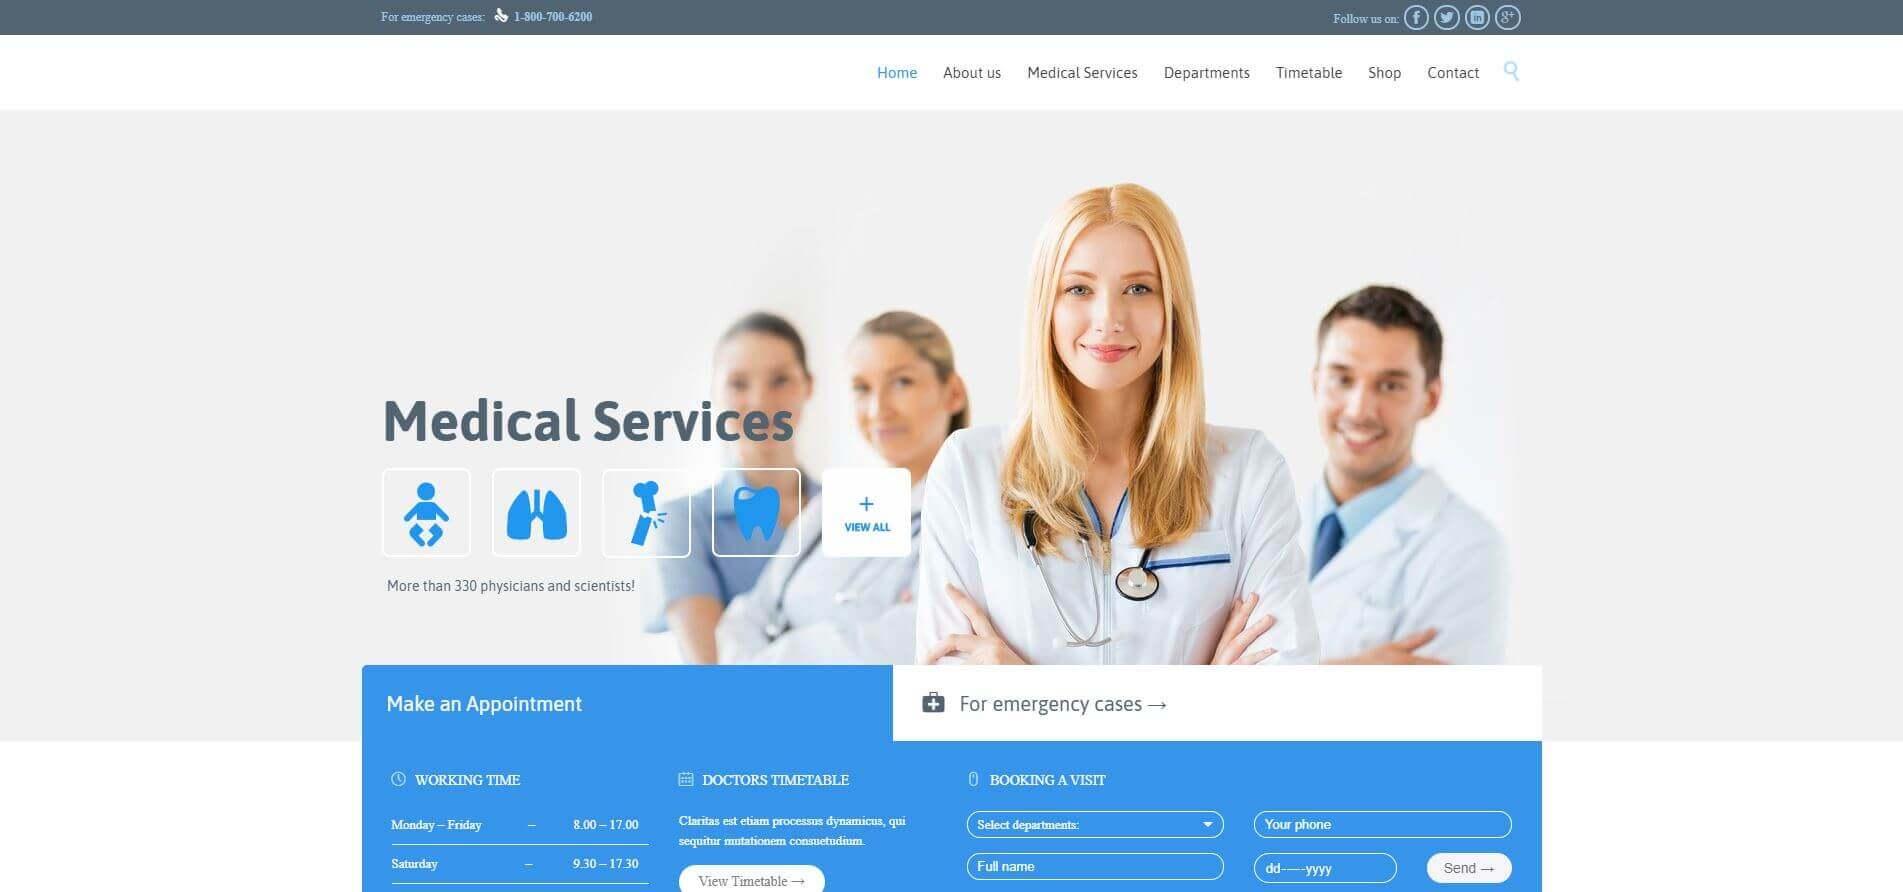 Medical Services - HealthCare Website